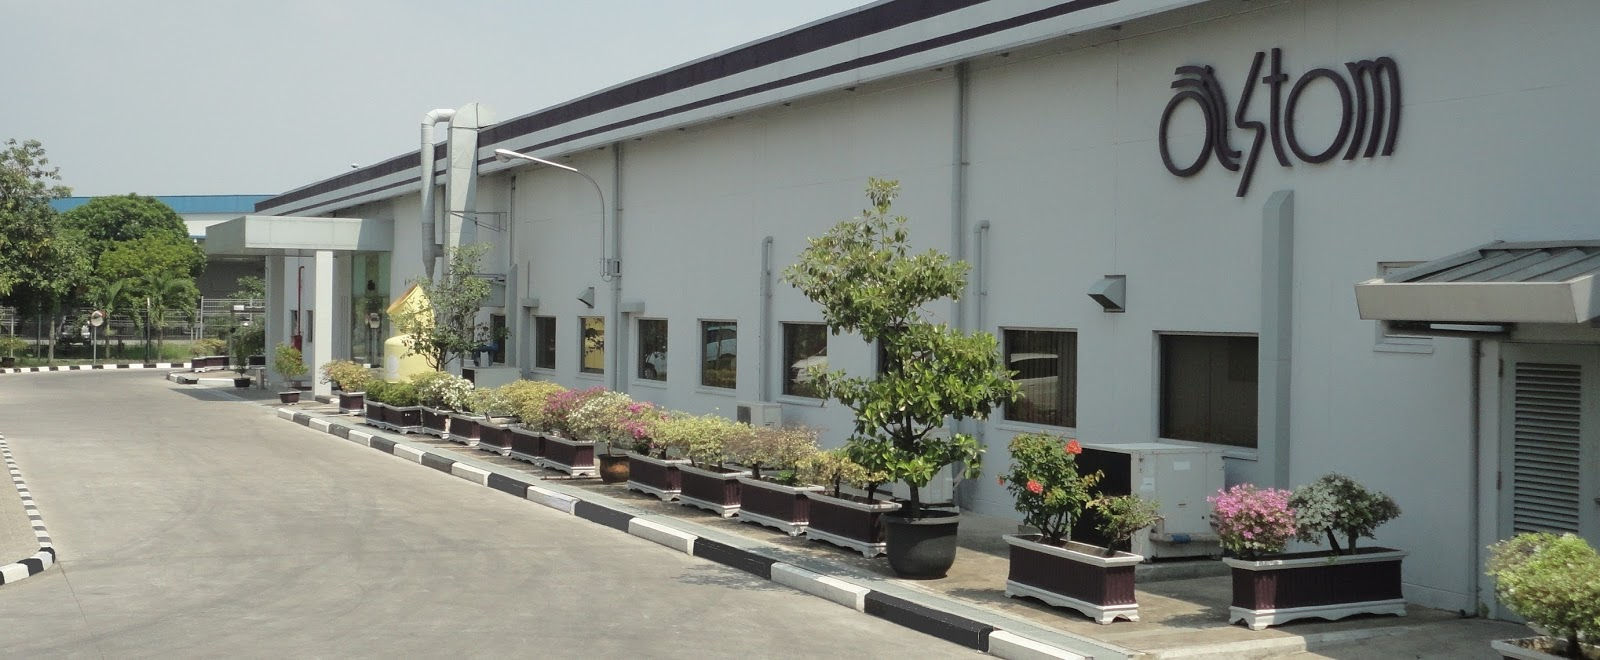 PT. Astom Indonesia - Operator Produksi